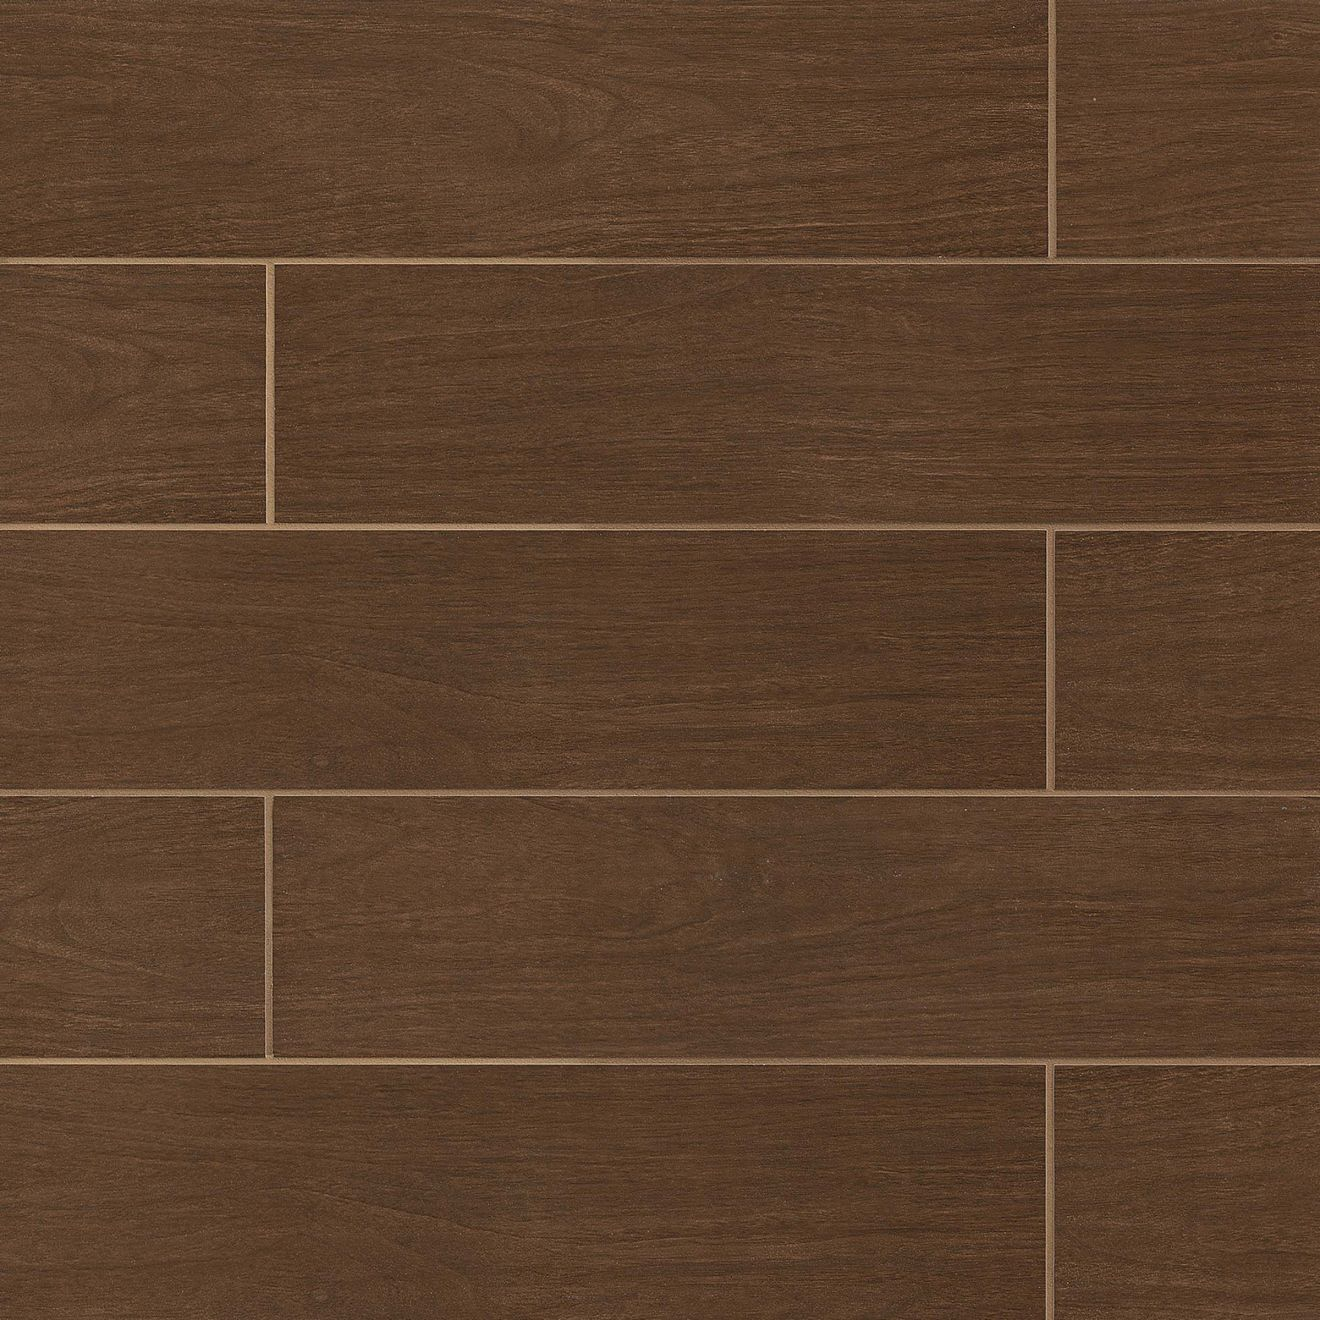 Wonderful 12X12 Ceiling Tile Replacement Huge 18 Floor Tile Regular 2X4 Drop Ceiling Tiles Home Depot 2X4 Subway Tile Old 2X8 Subway Tile White3X6 White Subway Tile Lowes 6X24 Heathland Walnut (Wood Look)